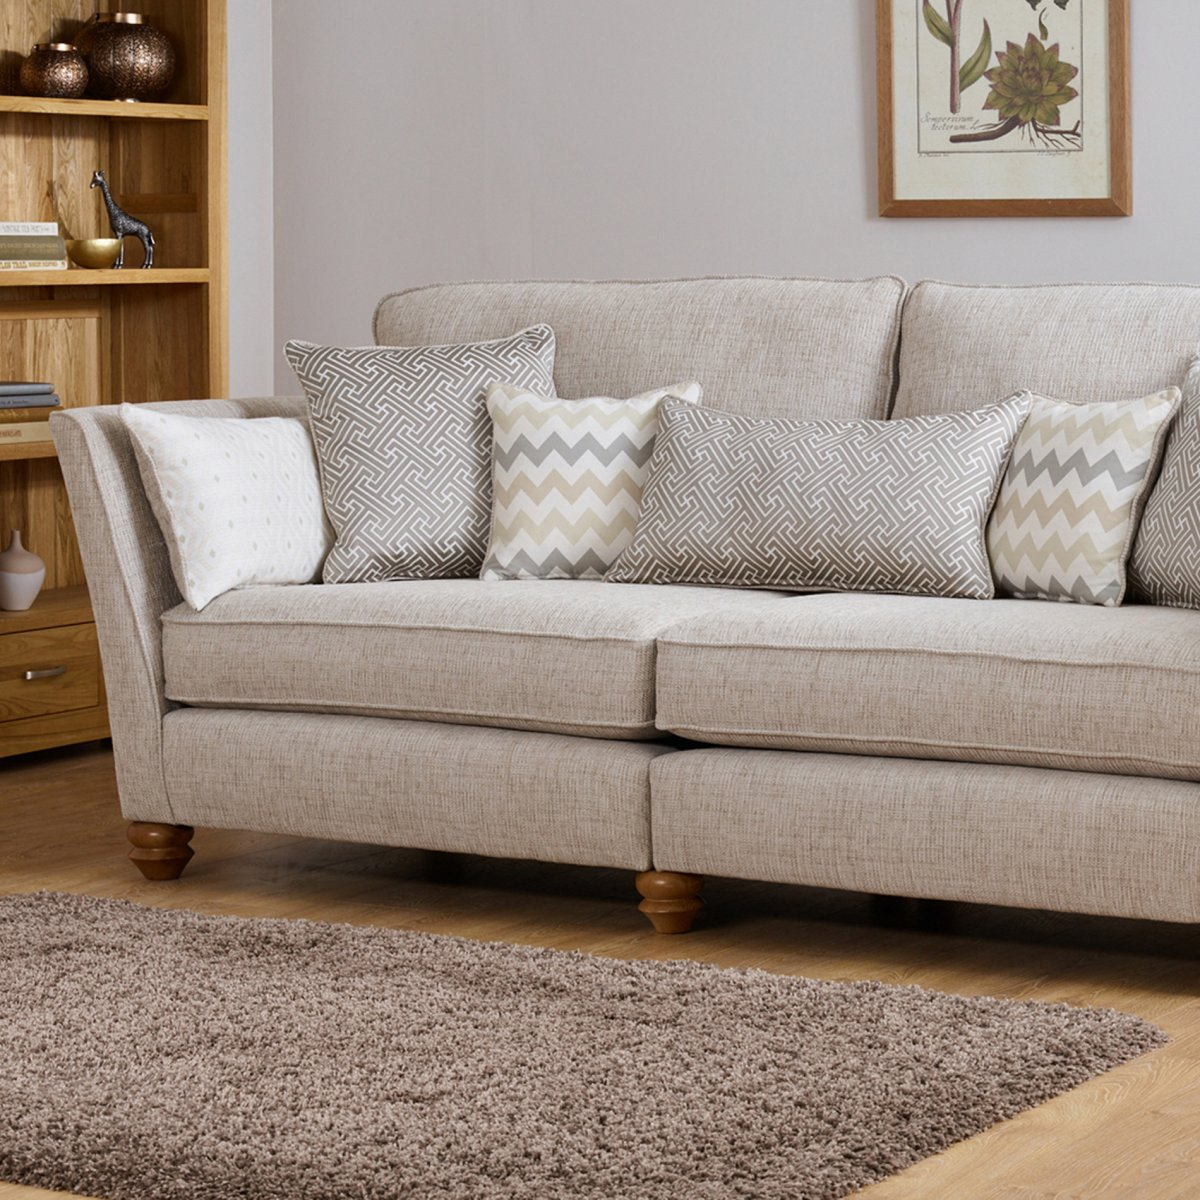 gainsborough 4 seater sofa in brown oak furniture land. Black Bedroom Furniture Sets. Home Design Ideas